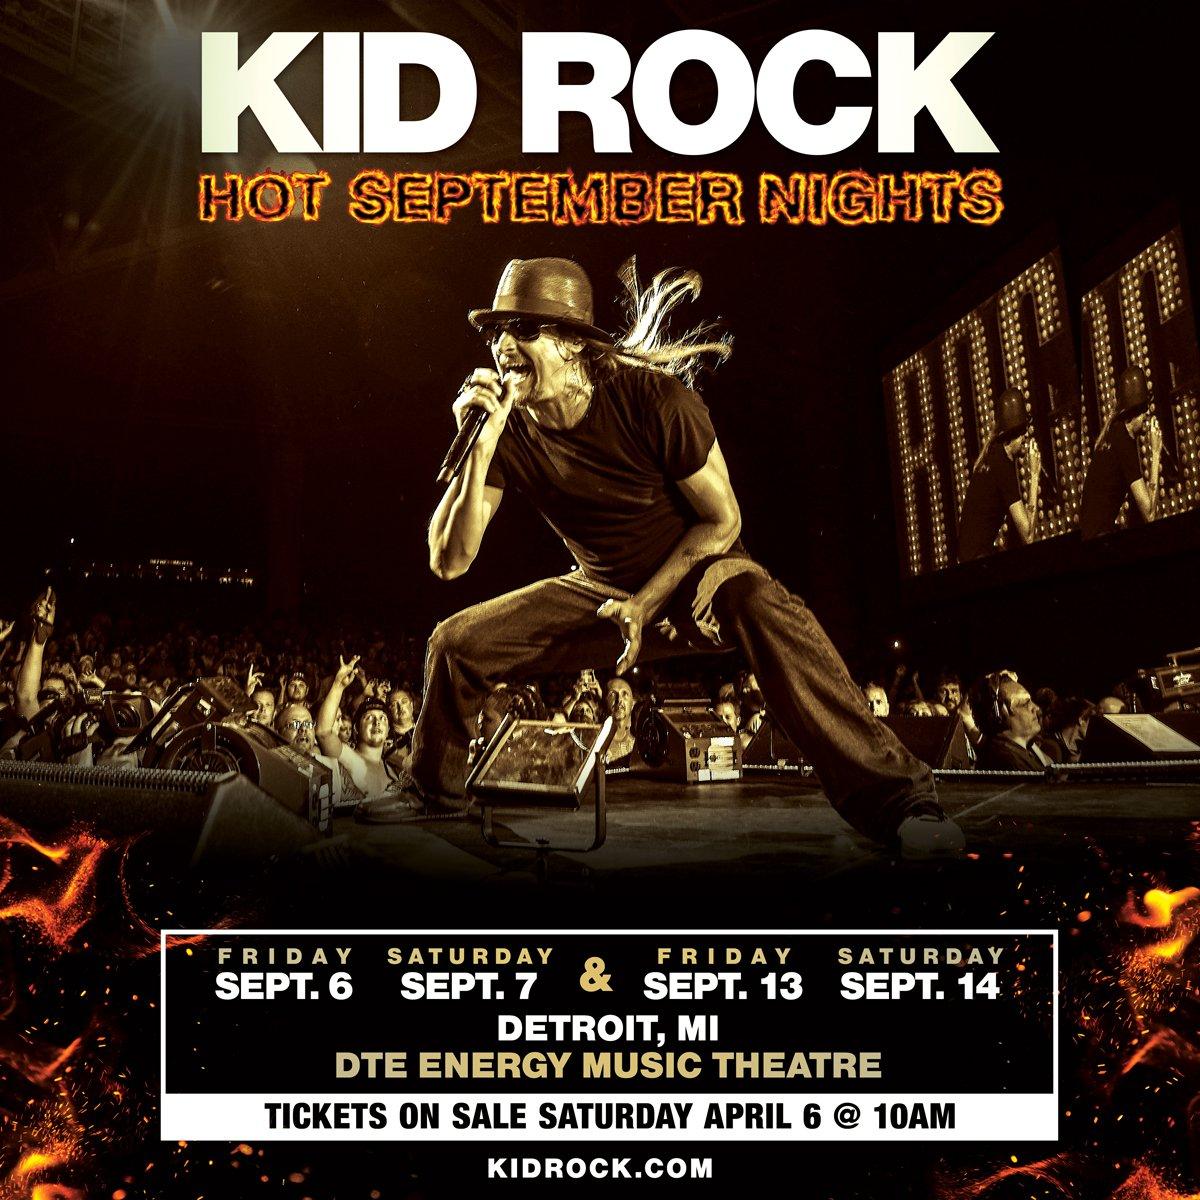 f4cf3c0cd Kid Rock   News, Photos and Videos   Page 2   Contactmusic.com